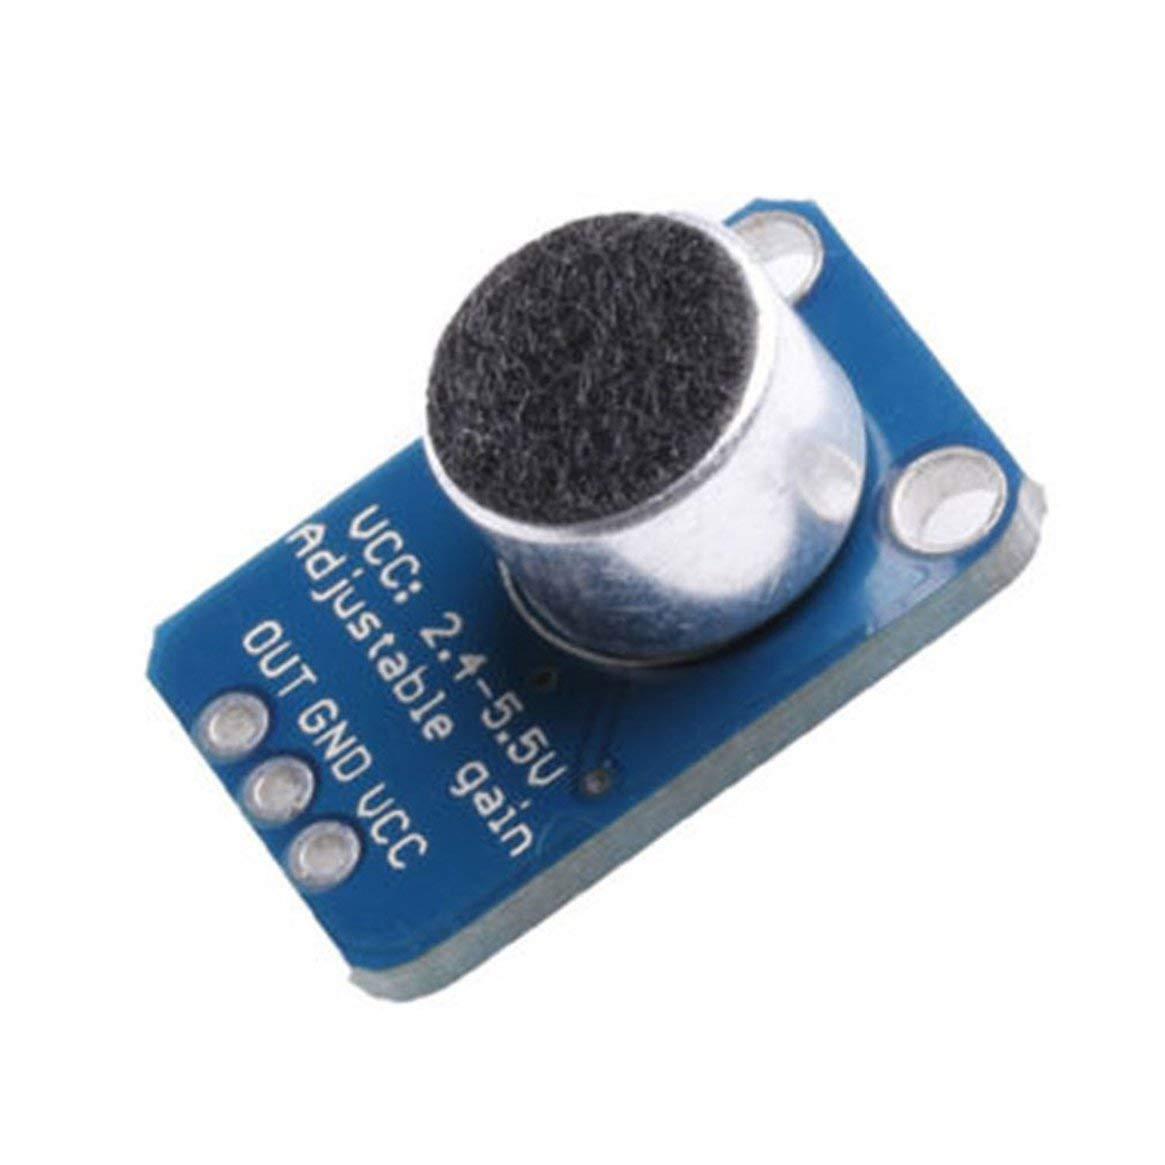 Azul y Negro GY-4466 M/ódulo de preamplificador de Alta precisi/ón Amplificador de micr/ófono Electret MAX4466 con Ganancia Ajustable para Arduino